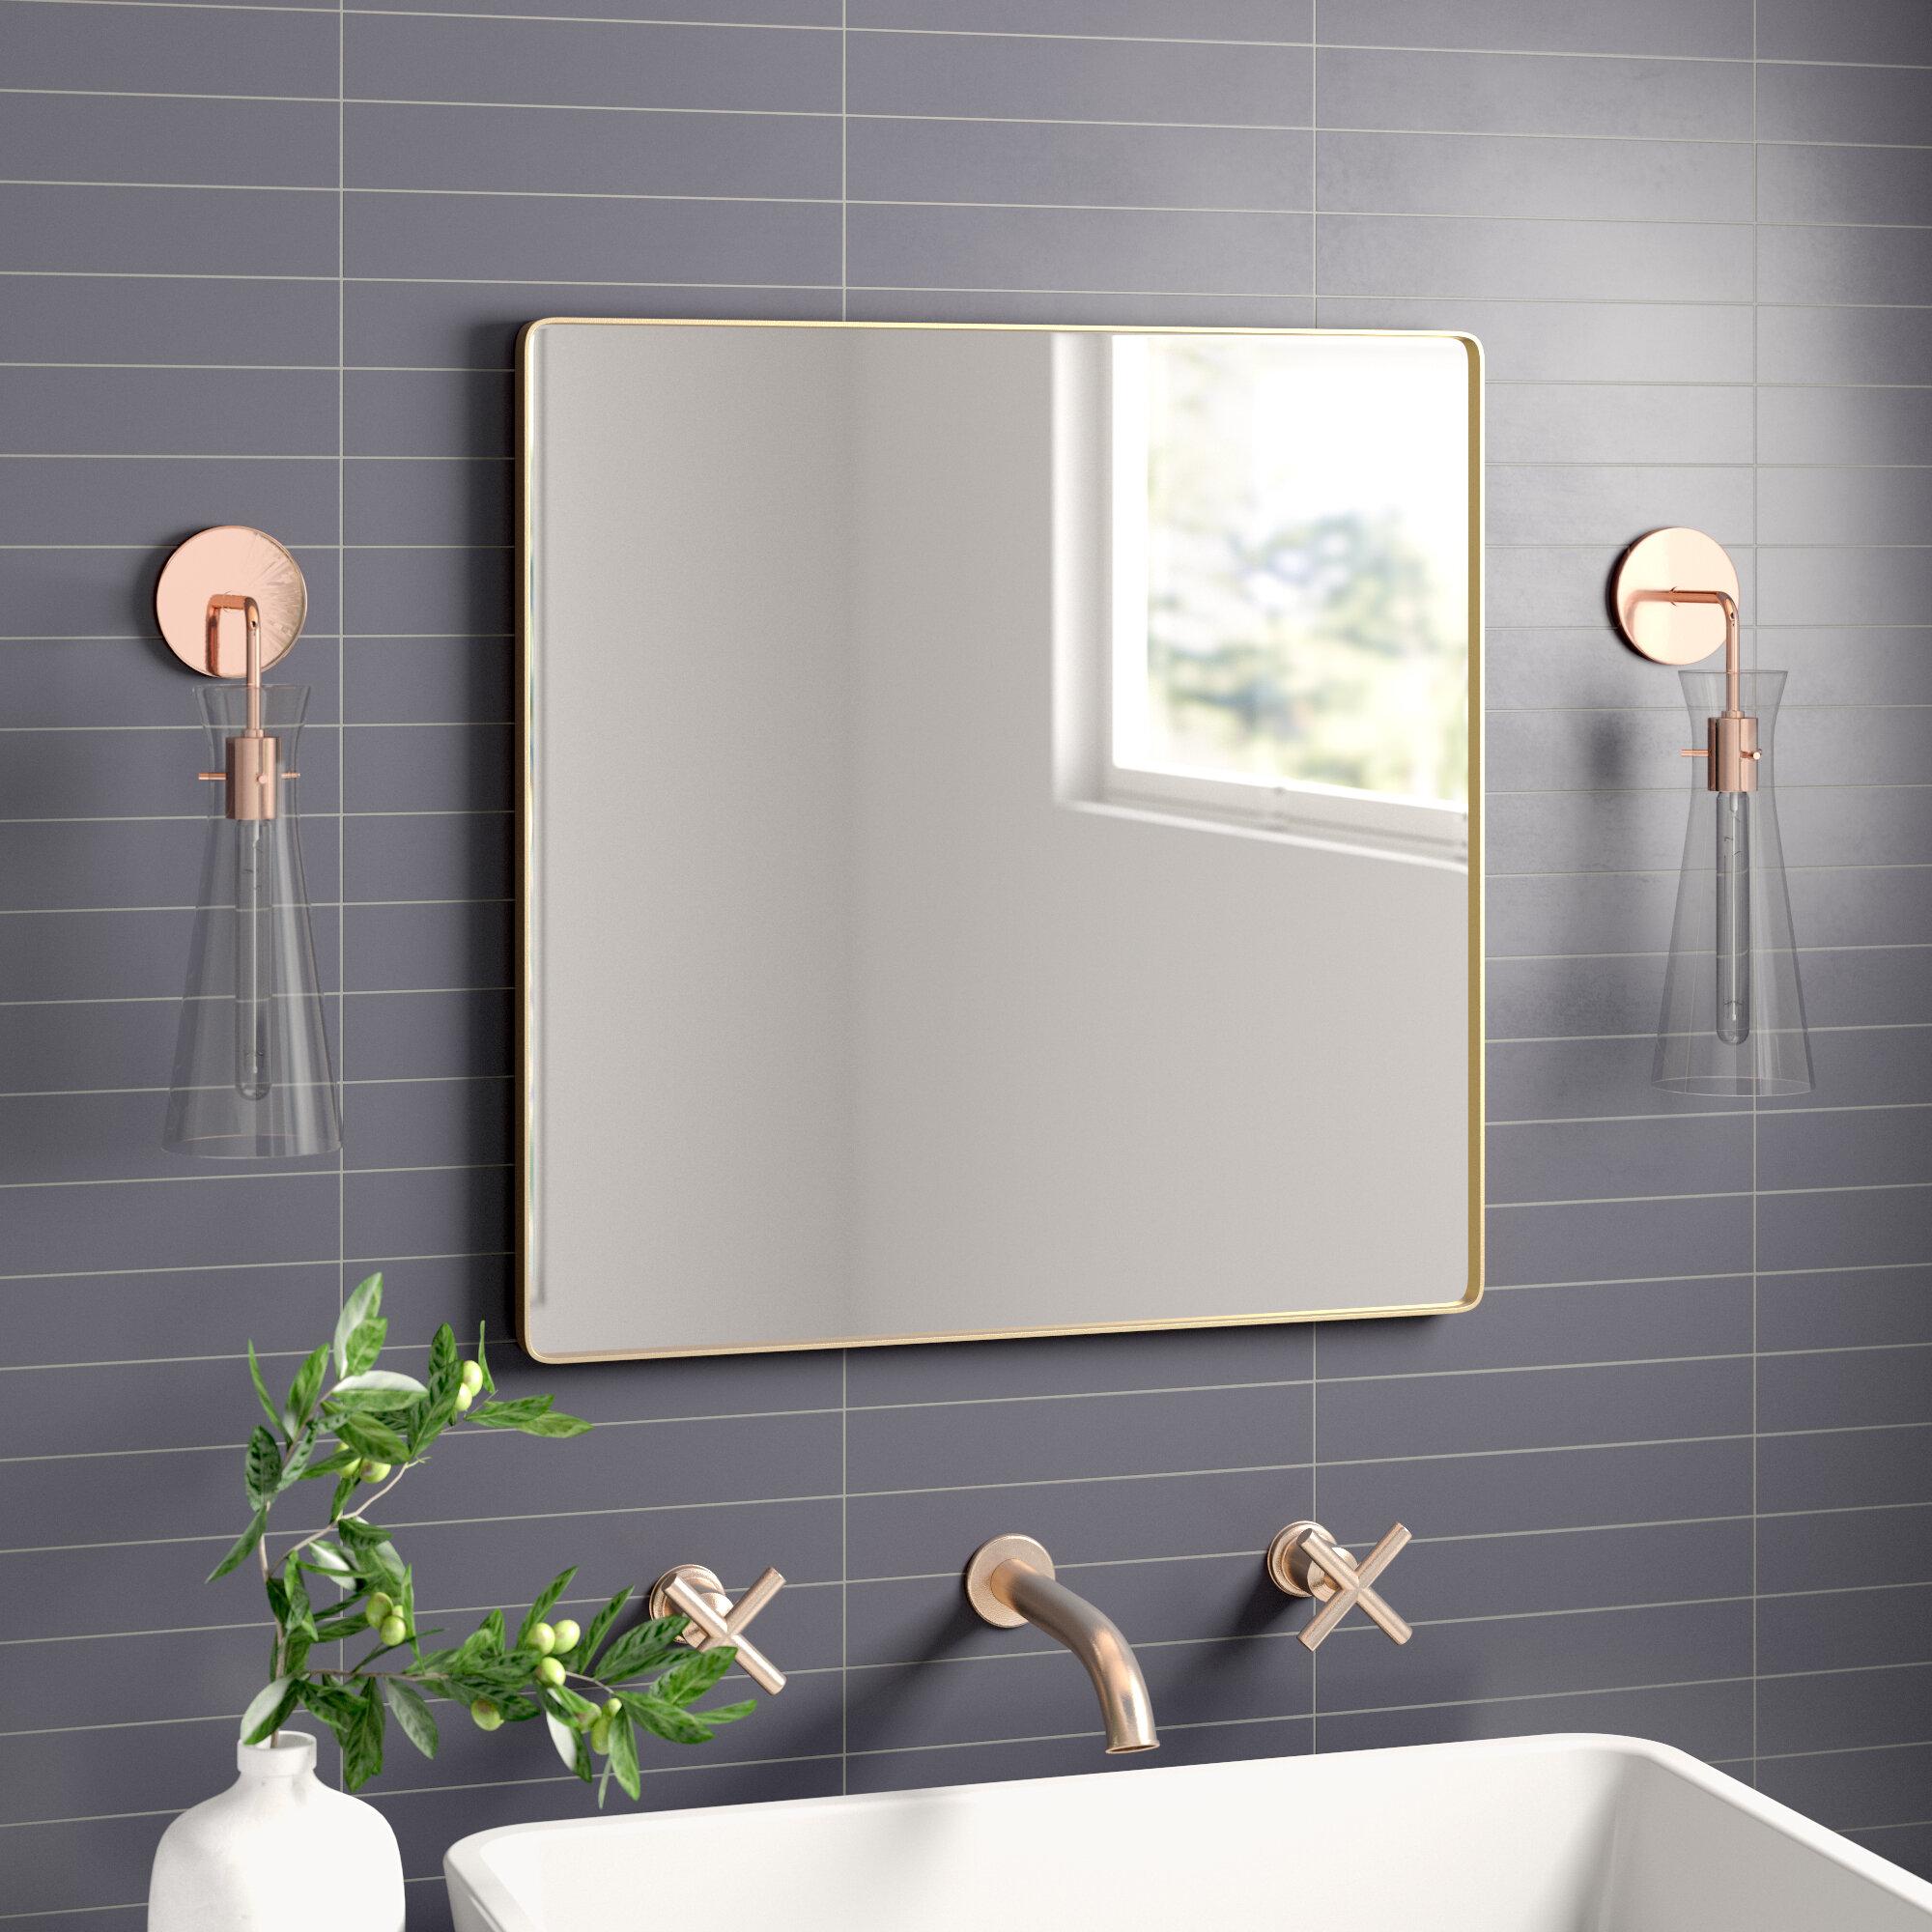 Theodore Modern & Contemporary Accent Mirror For Hub Modern And Contemporary Accent Mirrors (View 20 of 30)